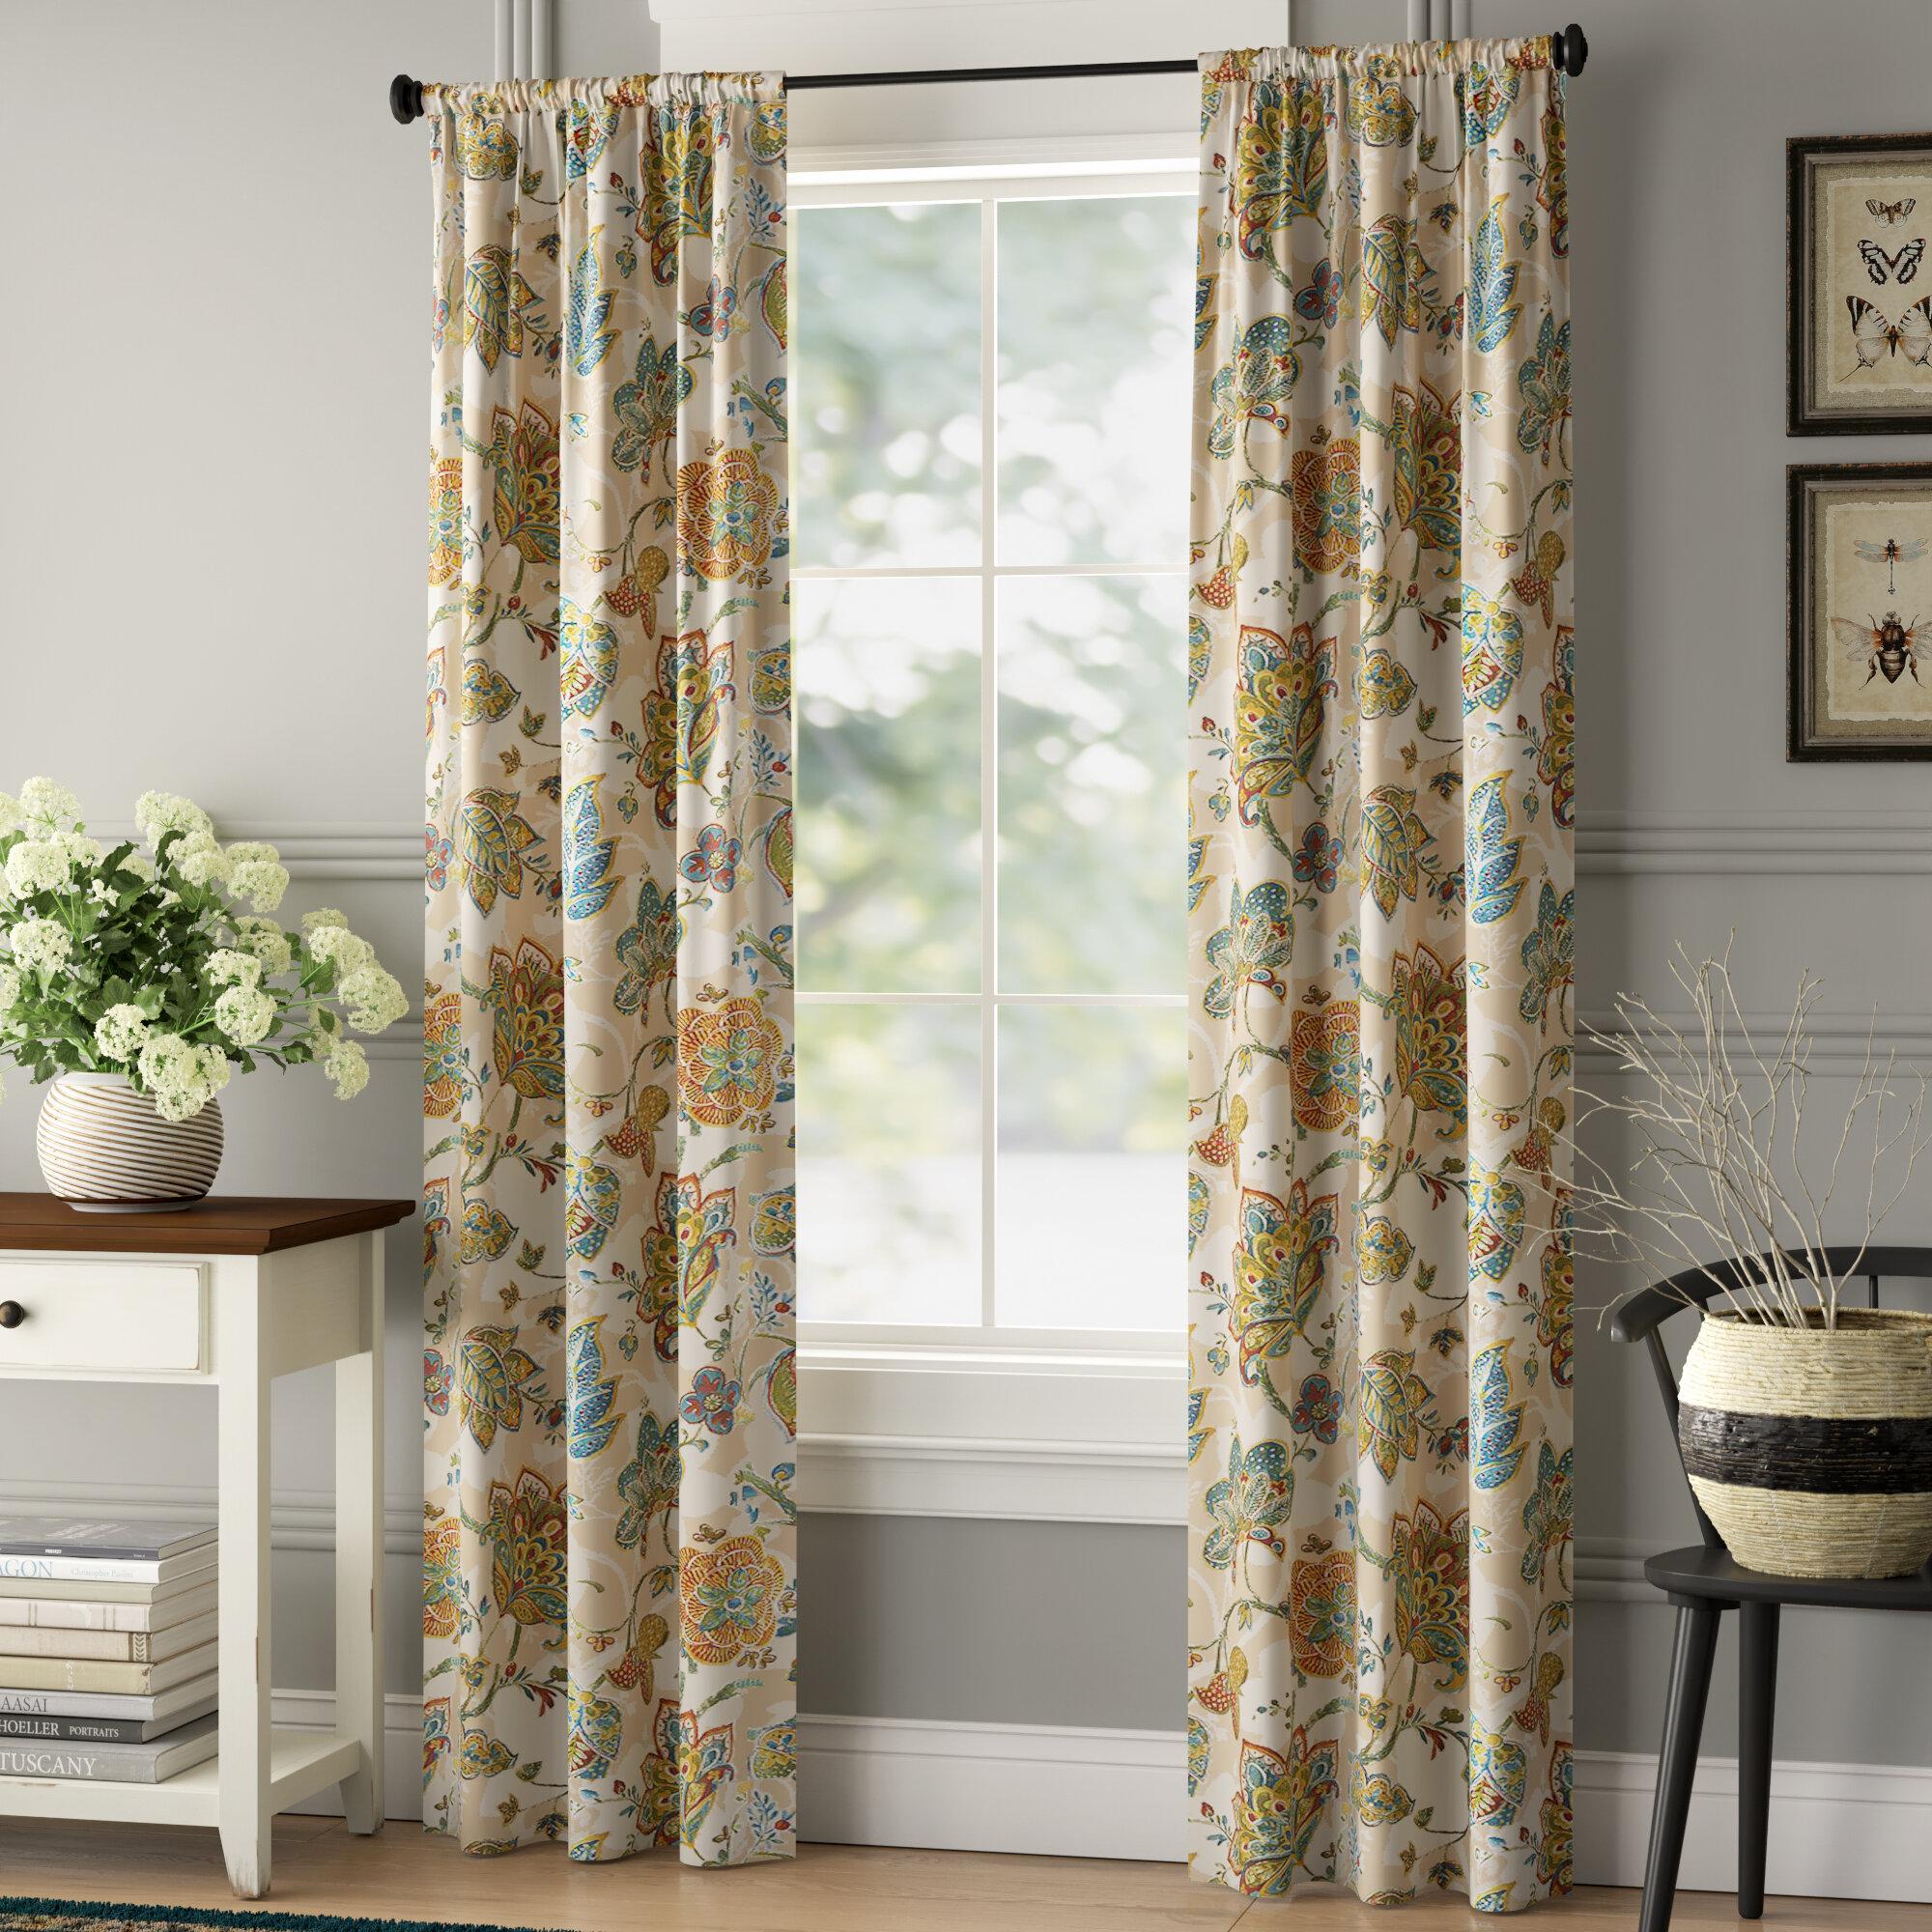 Orkin Nature Floral Semi Sheer Rod Pocket Curtain Panels Reviews Birch Lane